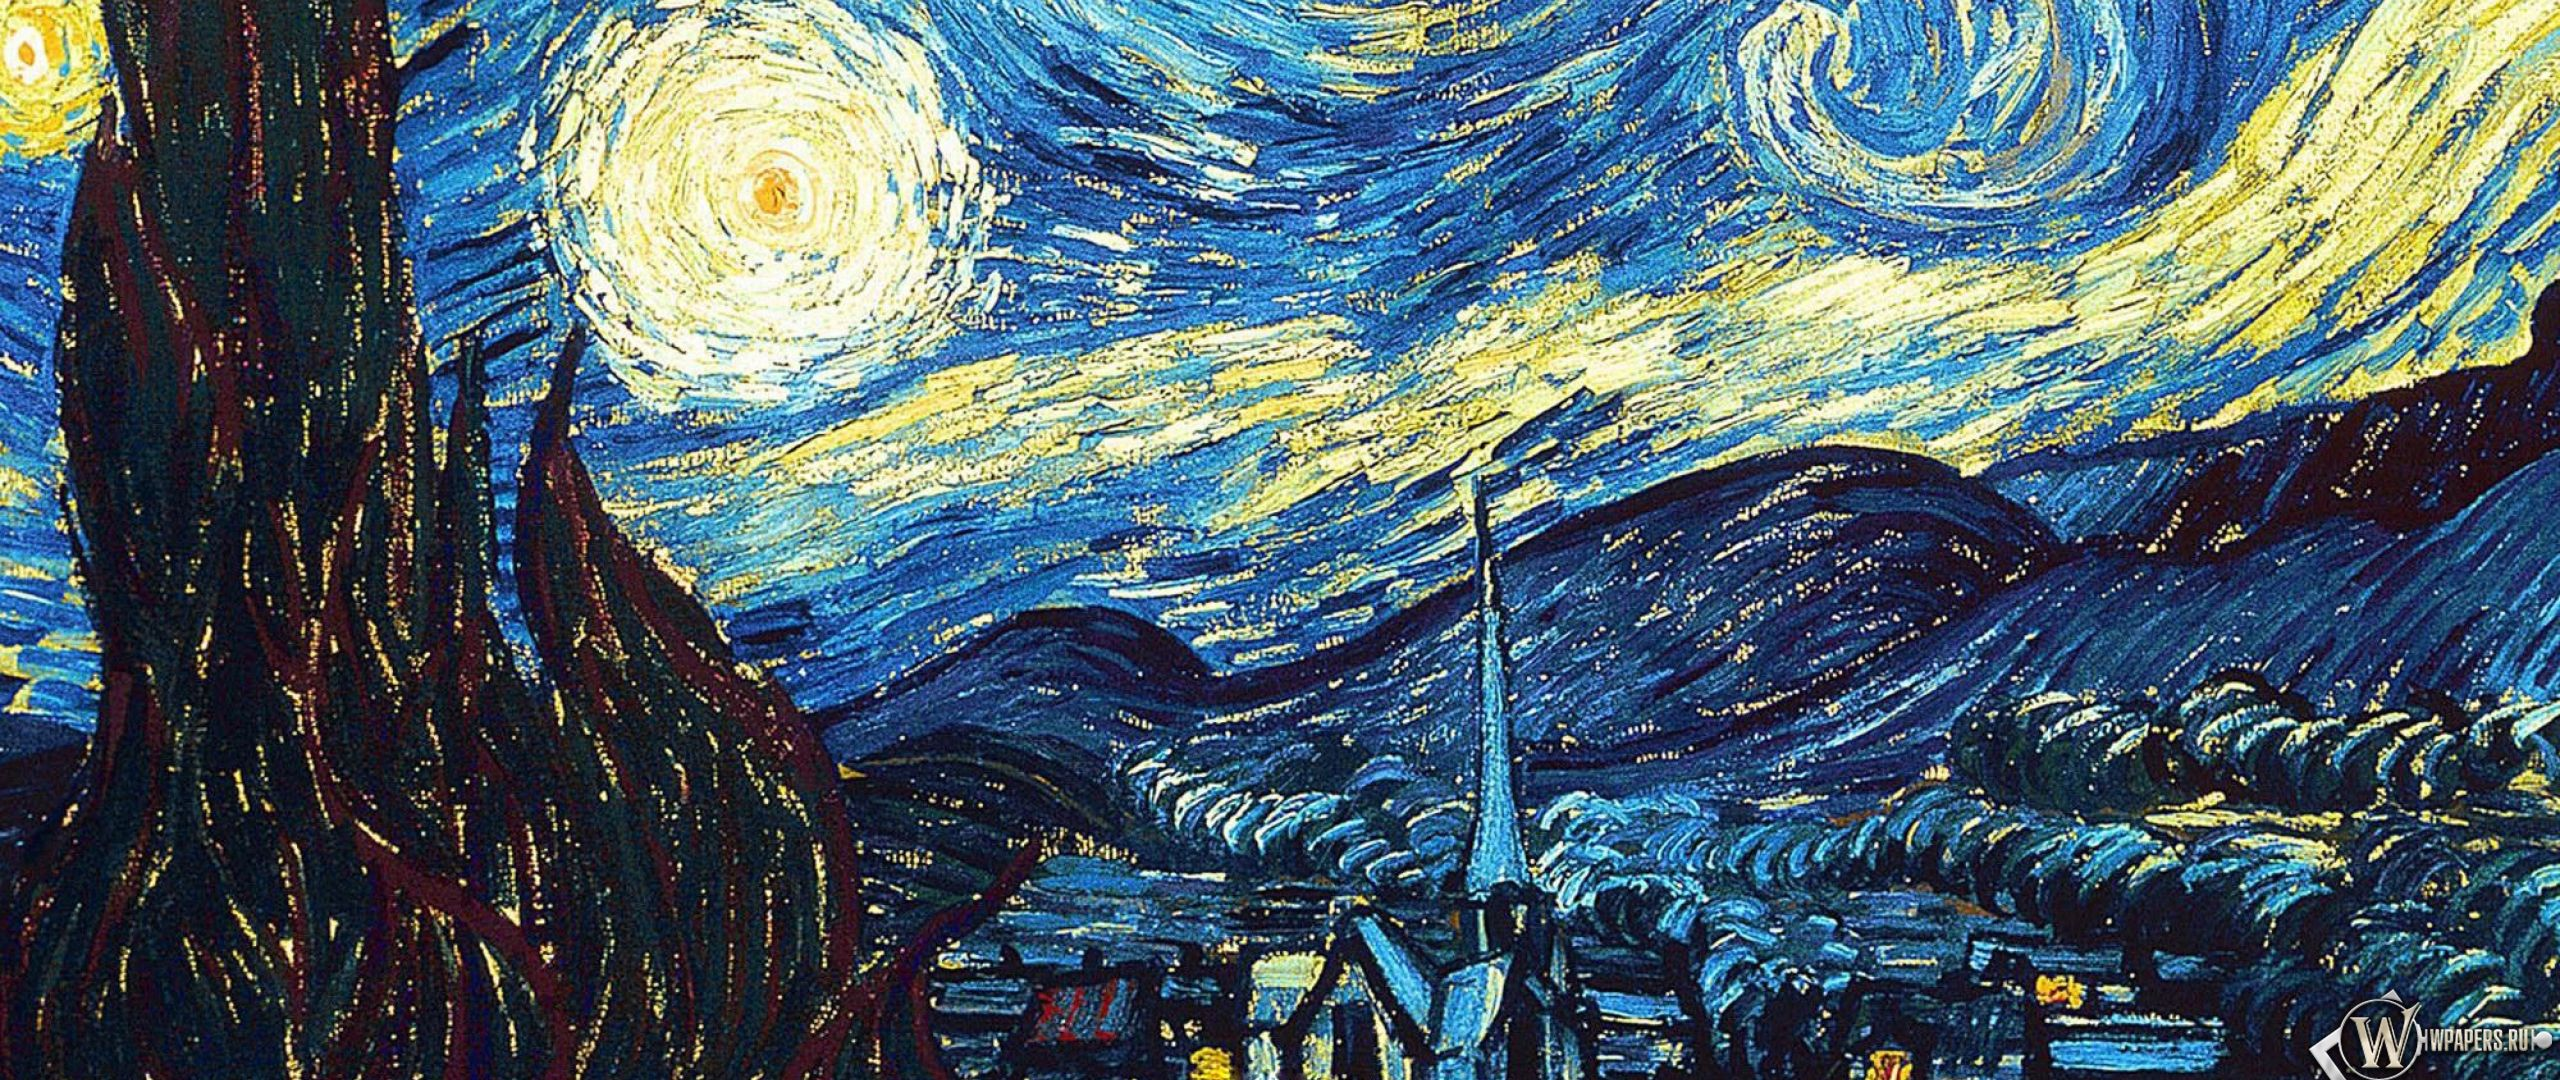 2560x1080 Wallpaper vincent van gogh, the starry night, oil, canvas